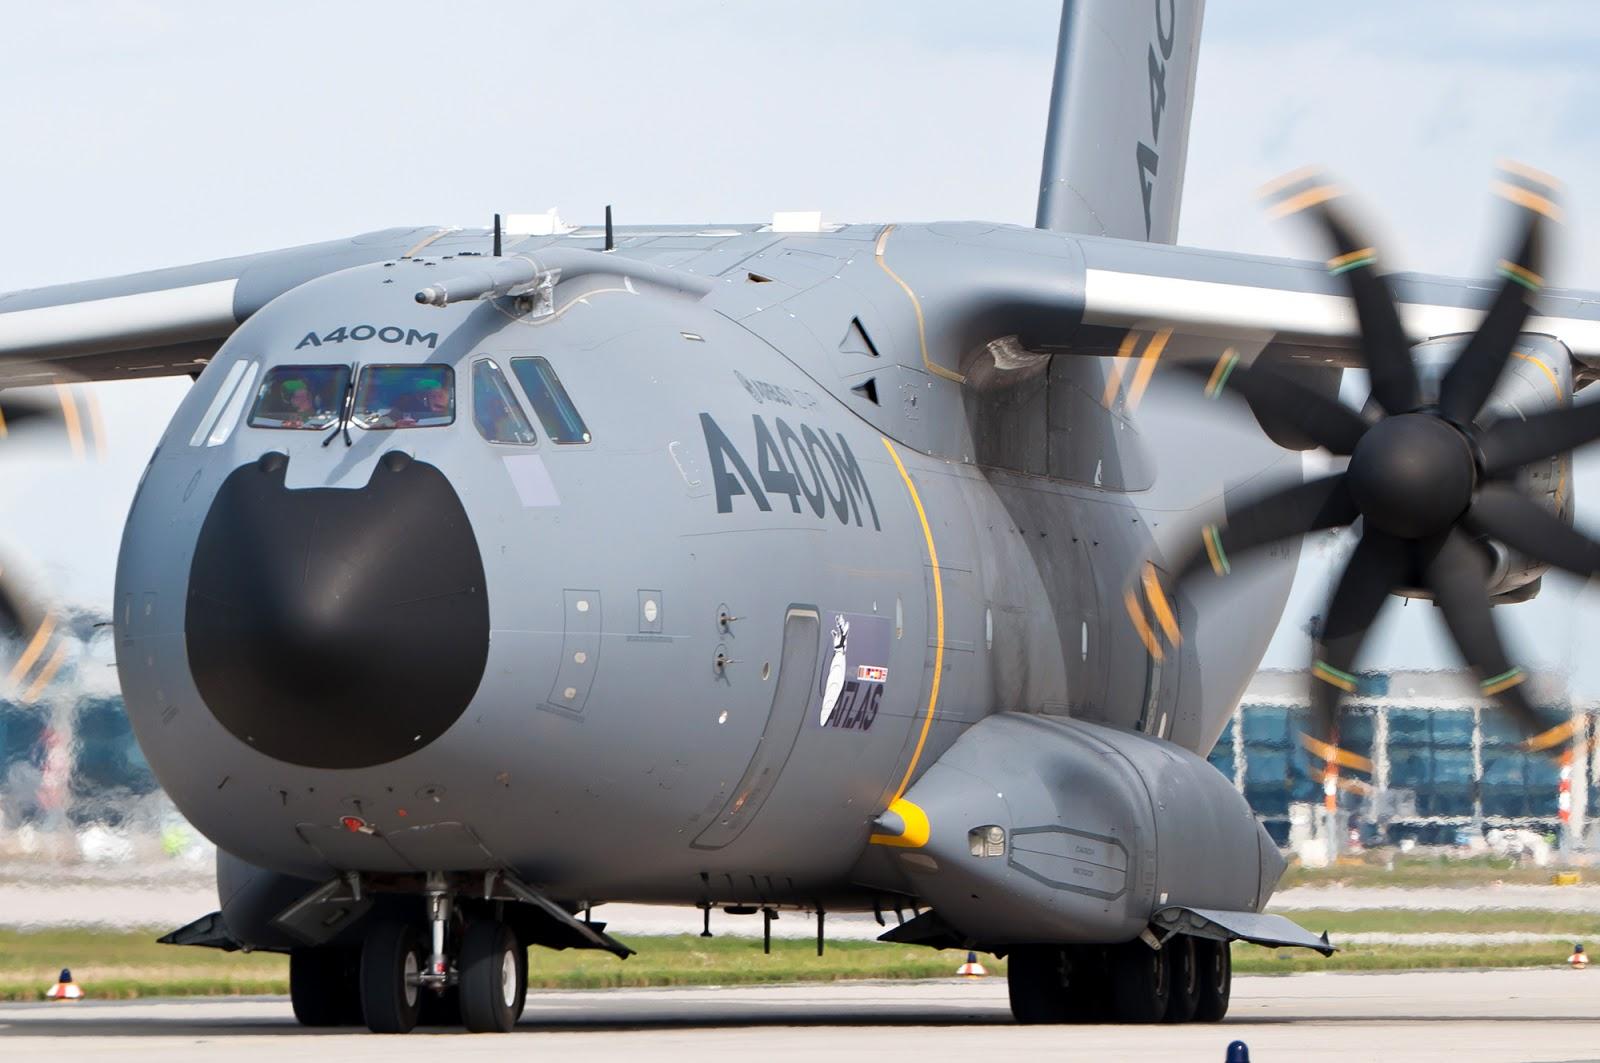 A-400M Airbus